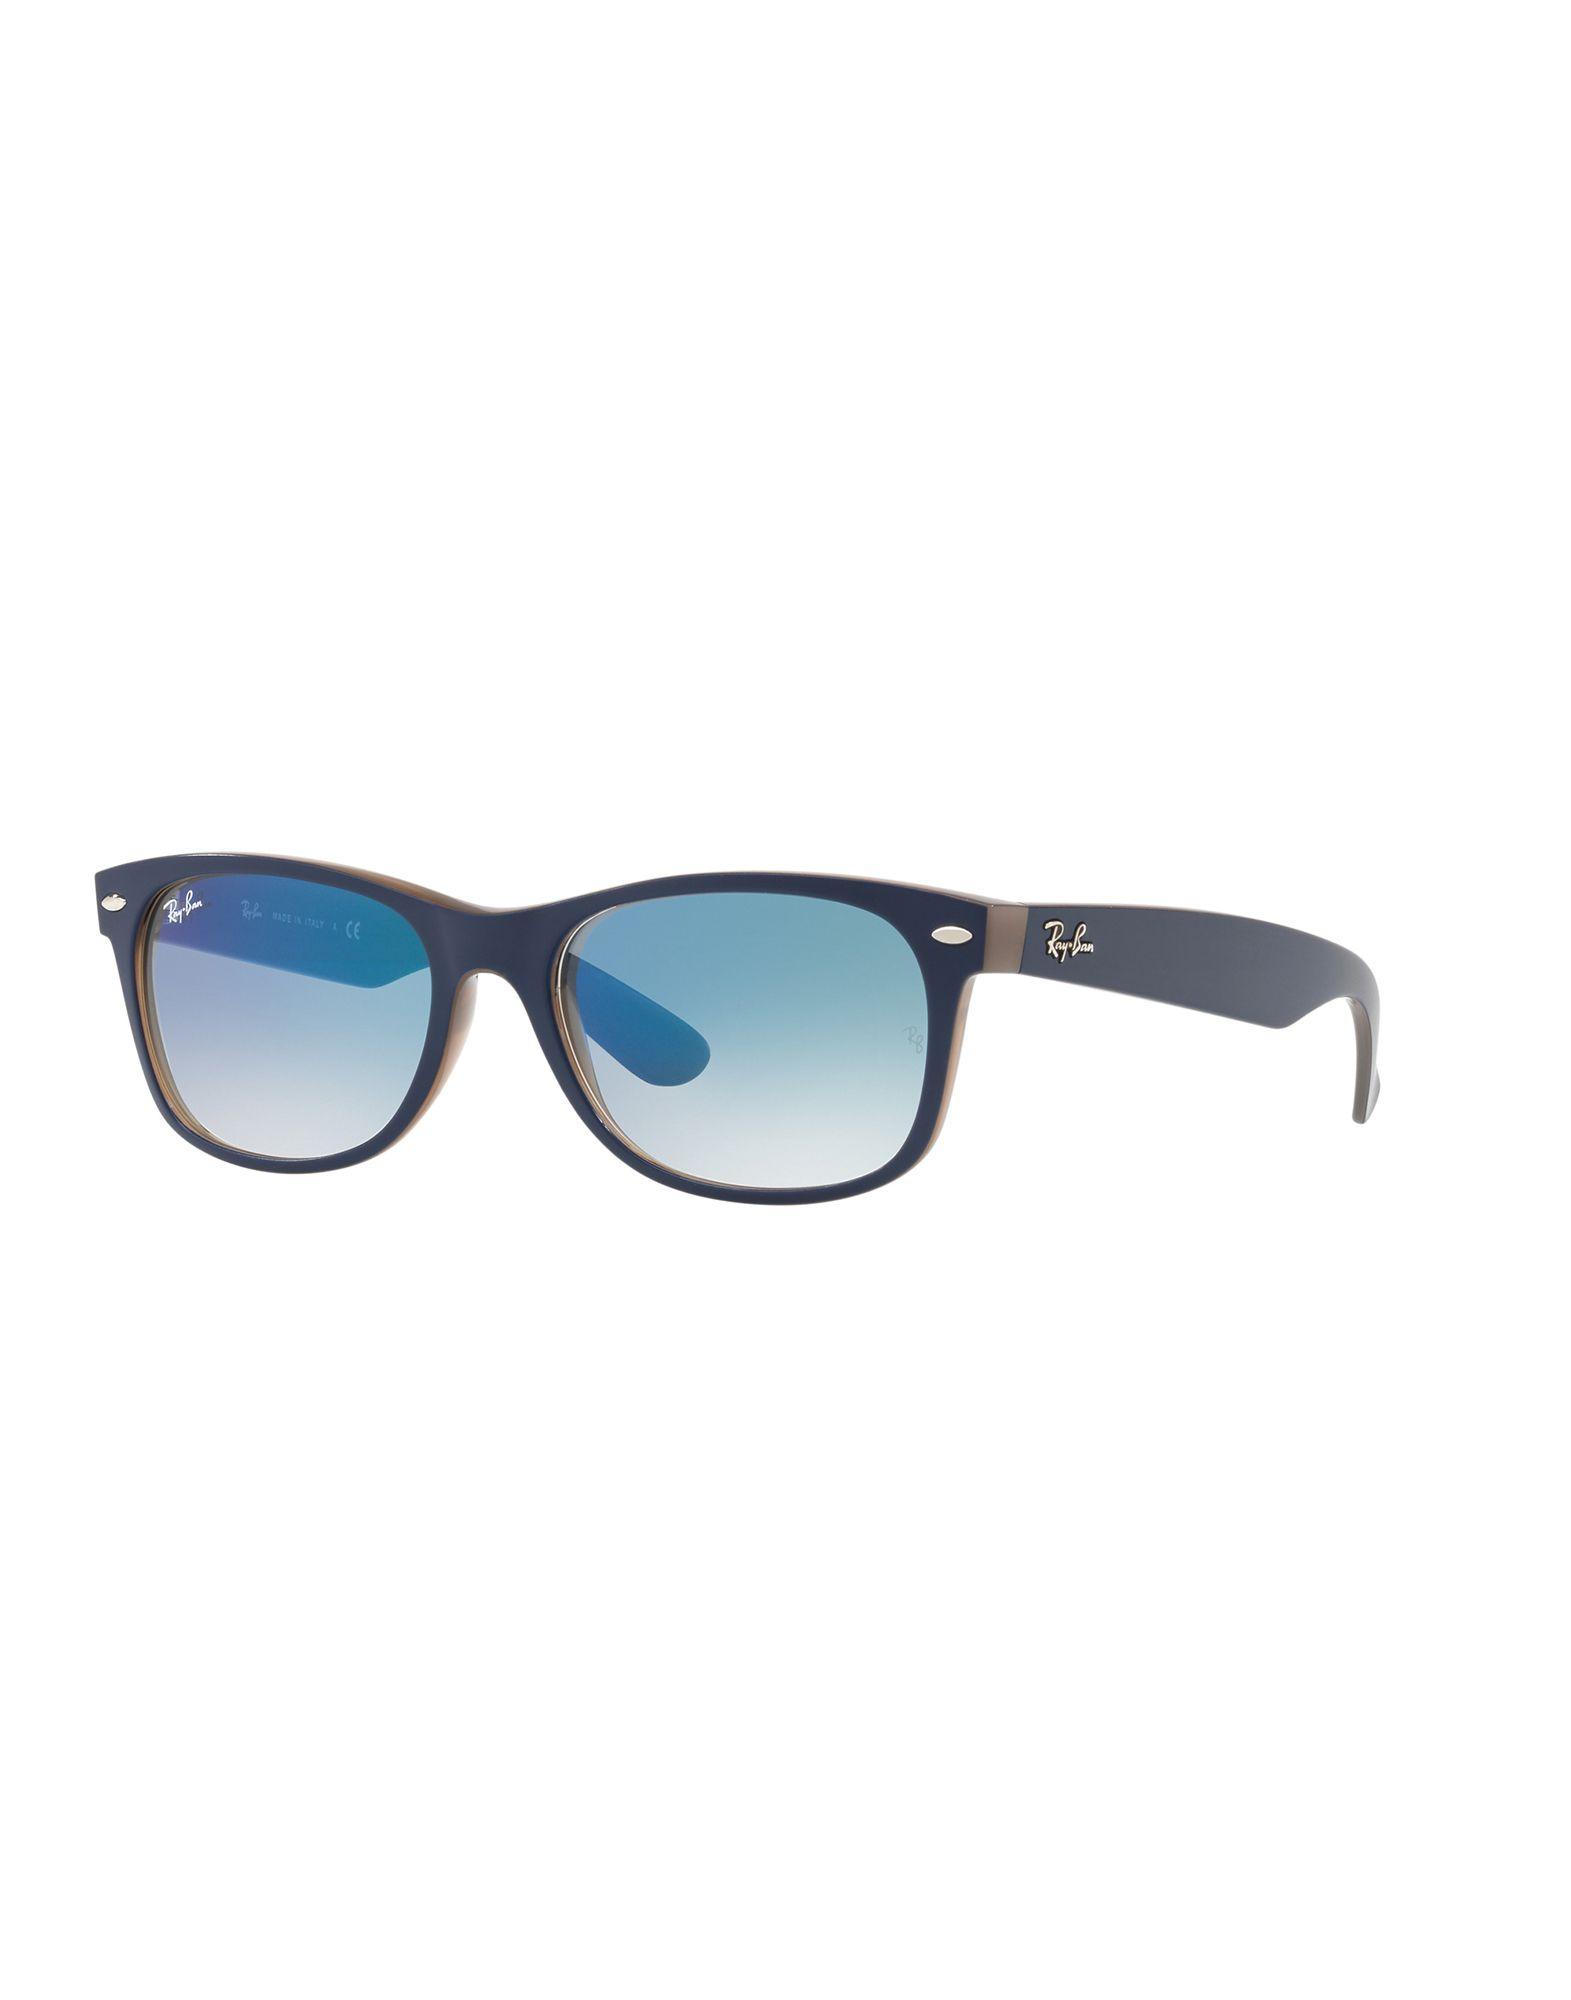 RAY-BAN Солнечные очки ray ban очки ray ban 0rb3447n 001 3050